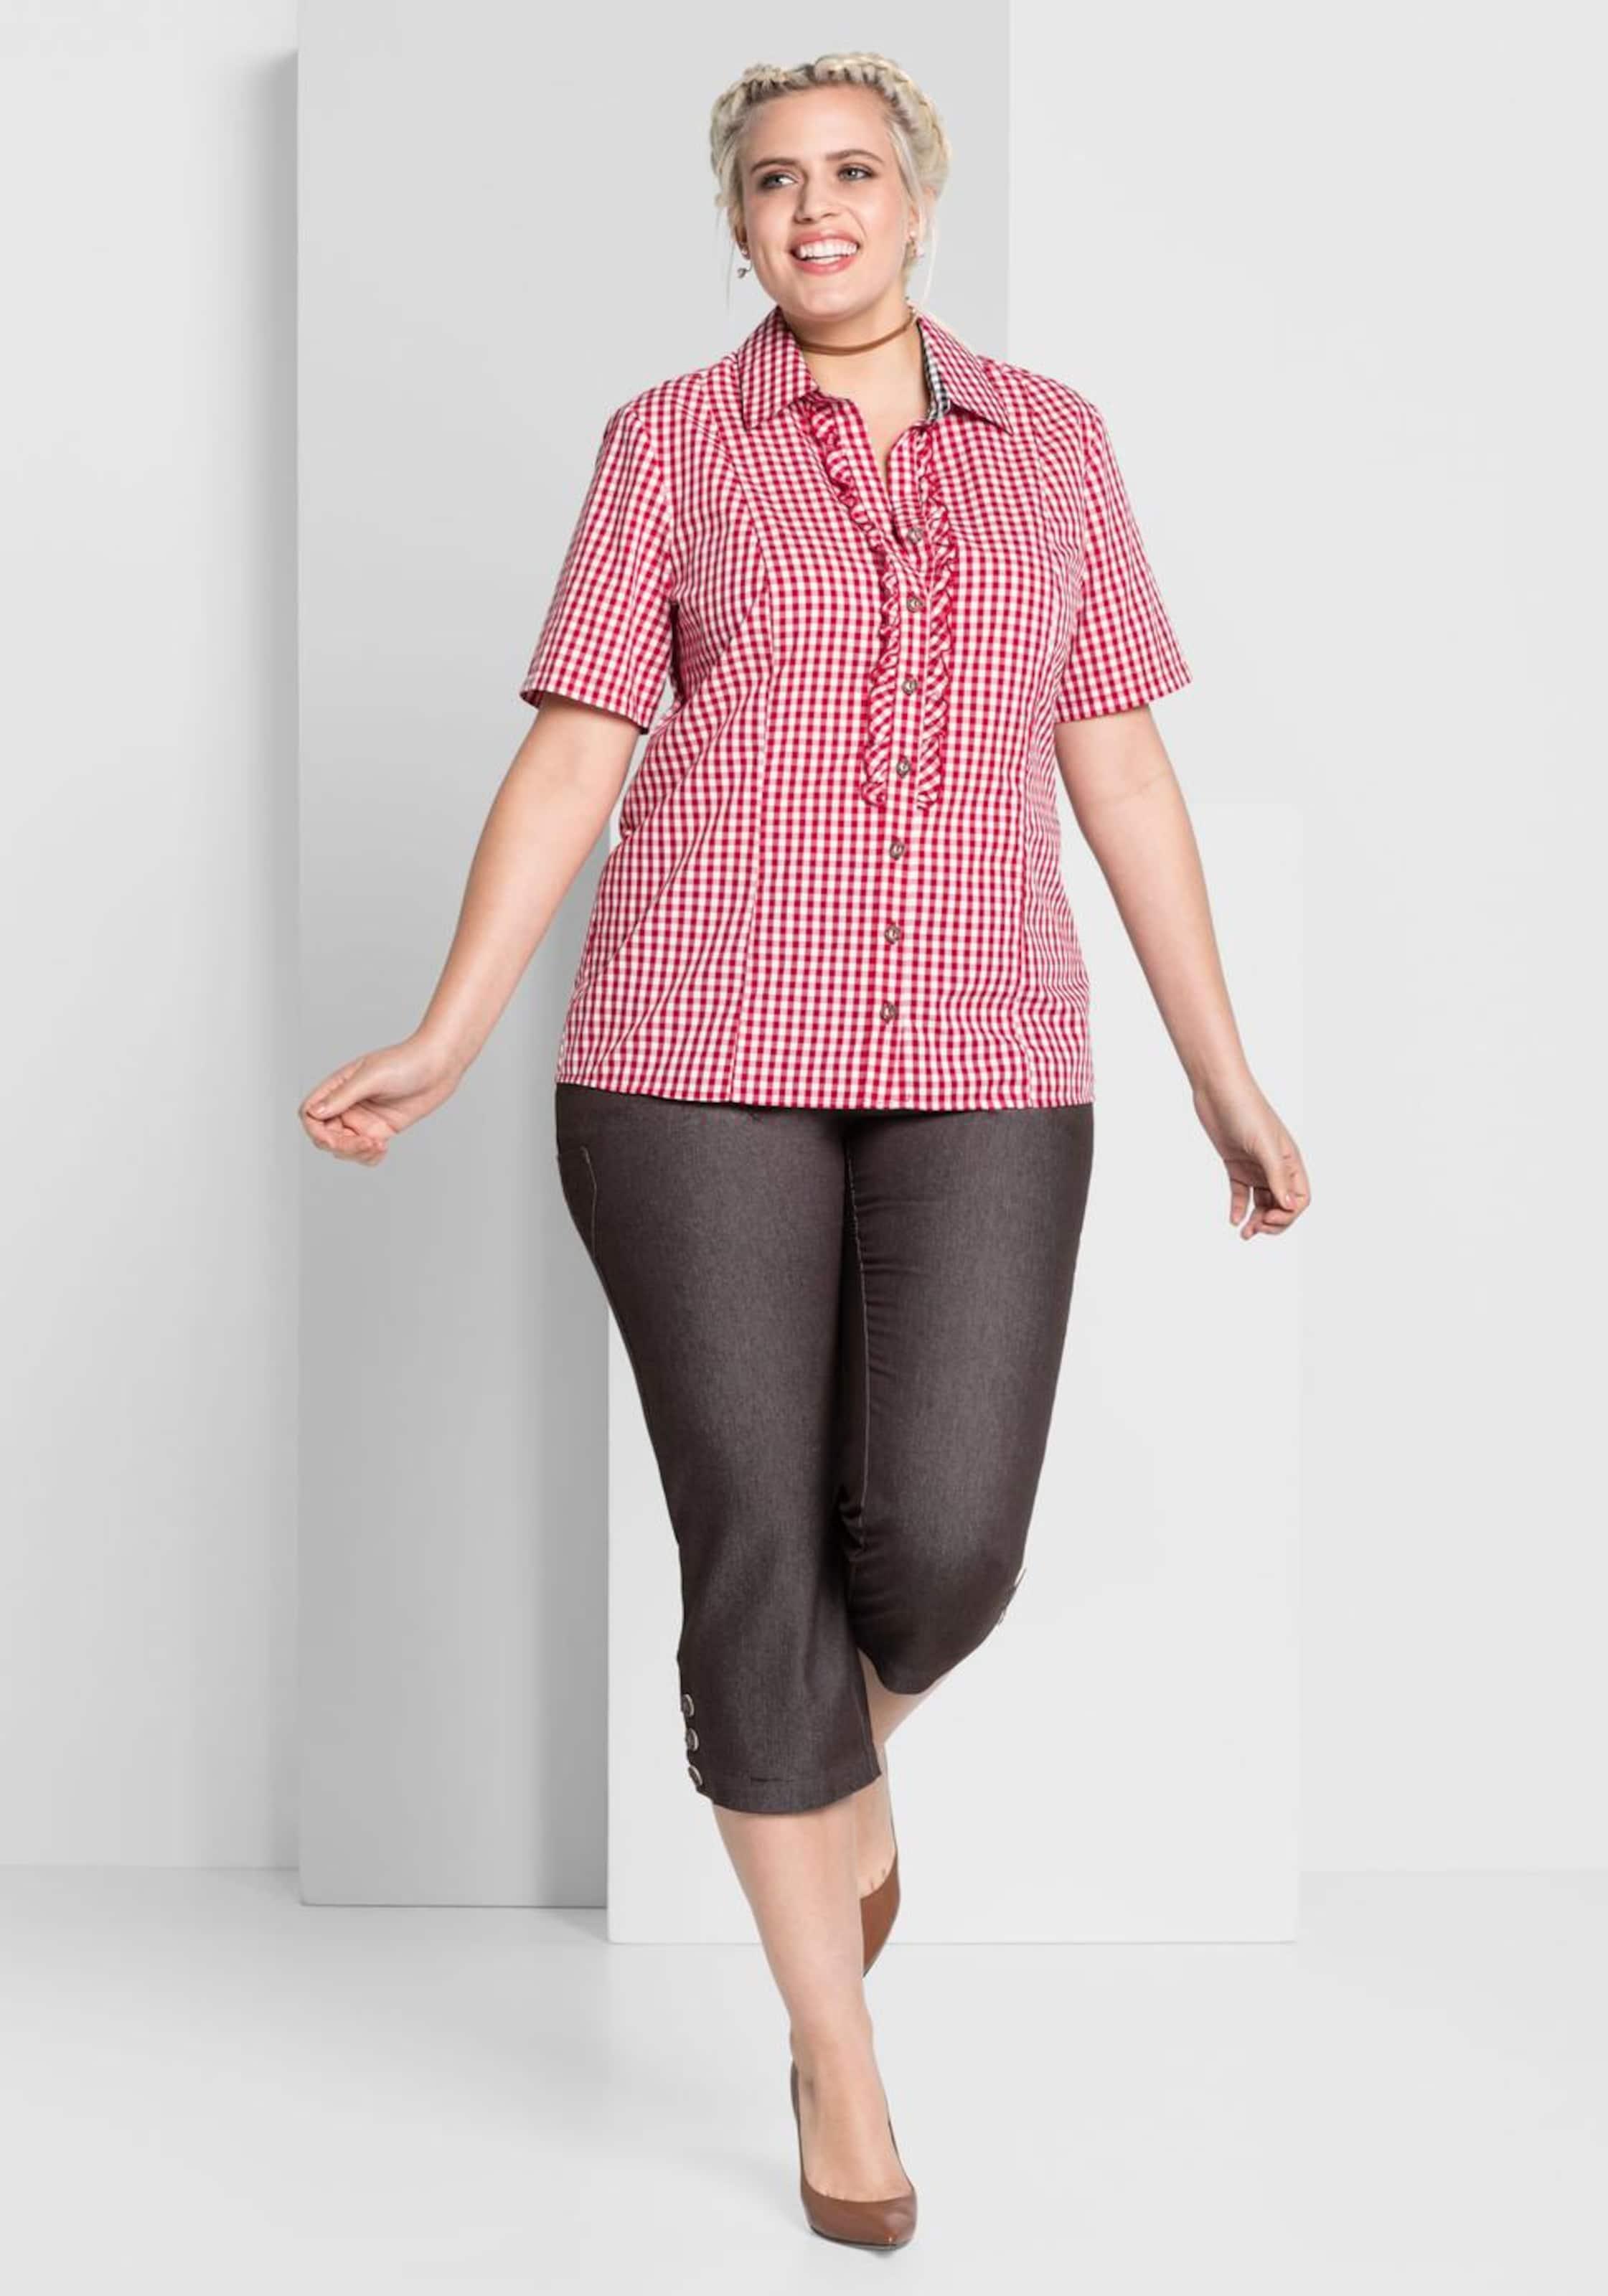 RotWeiß Bluse RotWeiß In Style Bluse Sheego Sheego In Style PXZiuOk